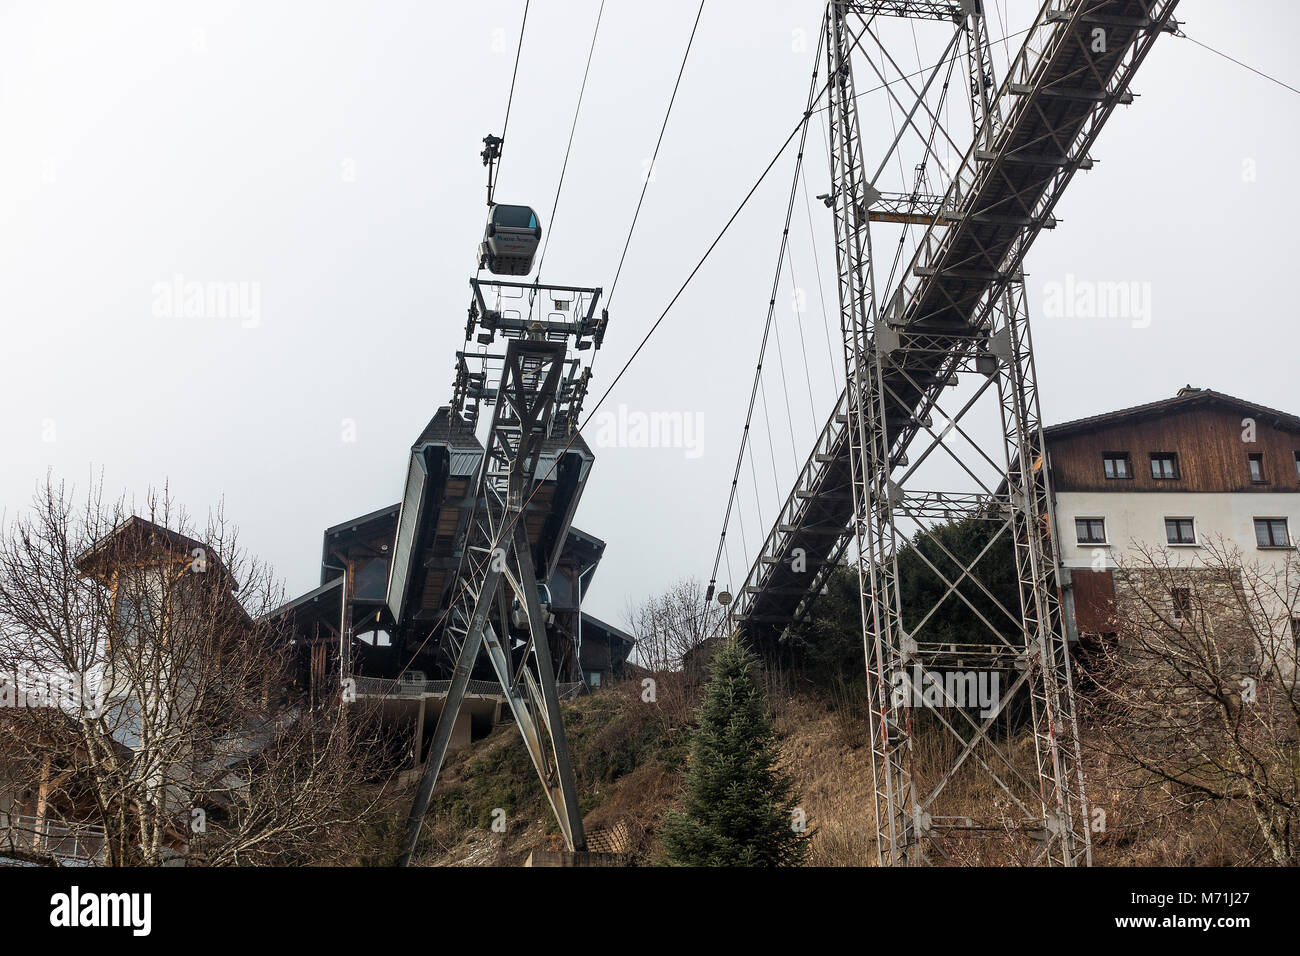 A Gondola Running Alongside a Suspension Bridge Walkway in the Ski Resort of Morzine Portes du Soleil Haute Savoie - Stock Image